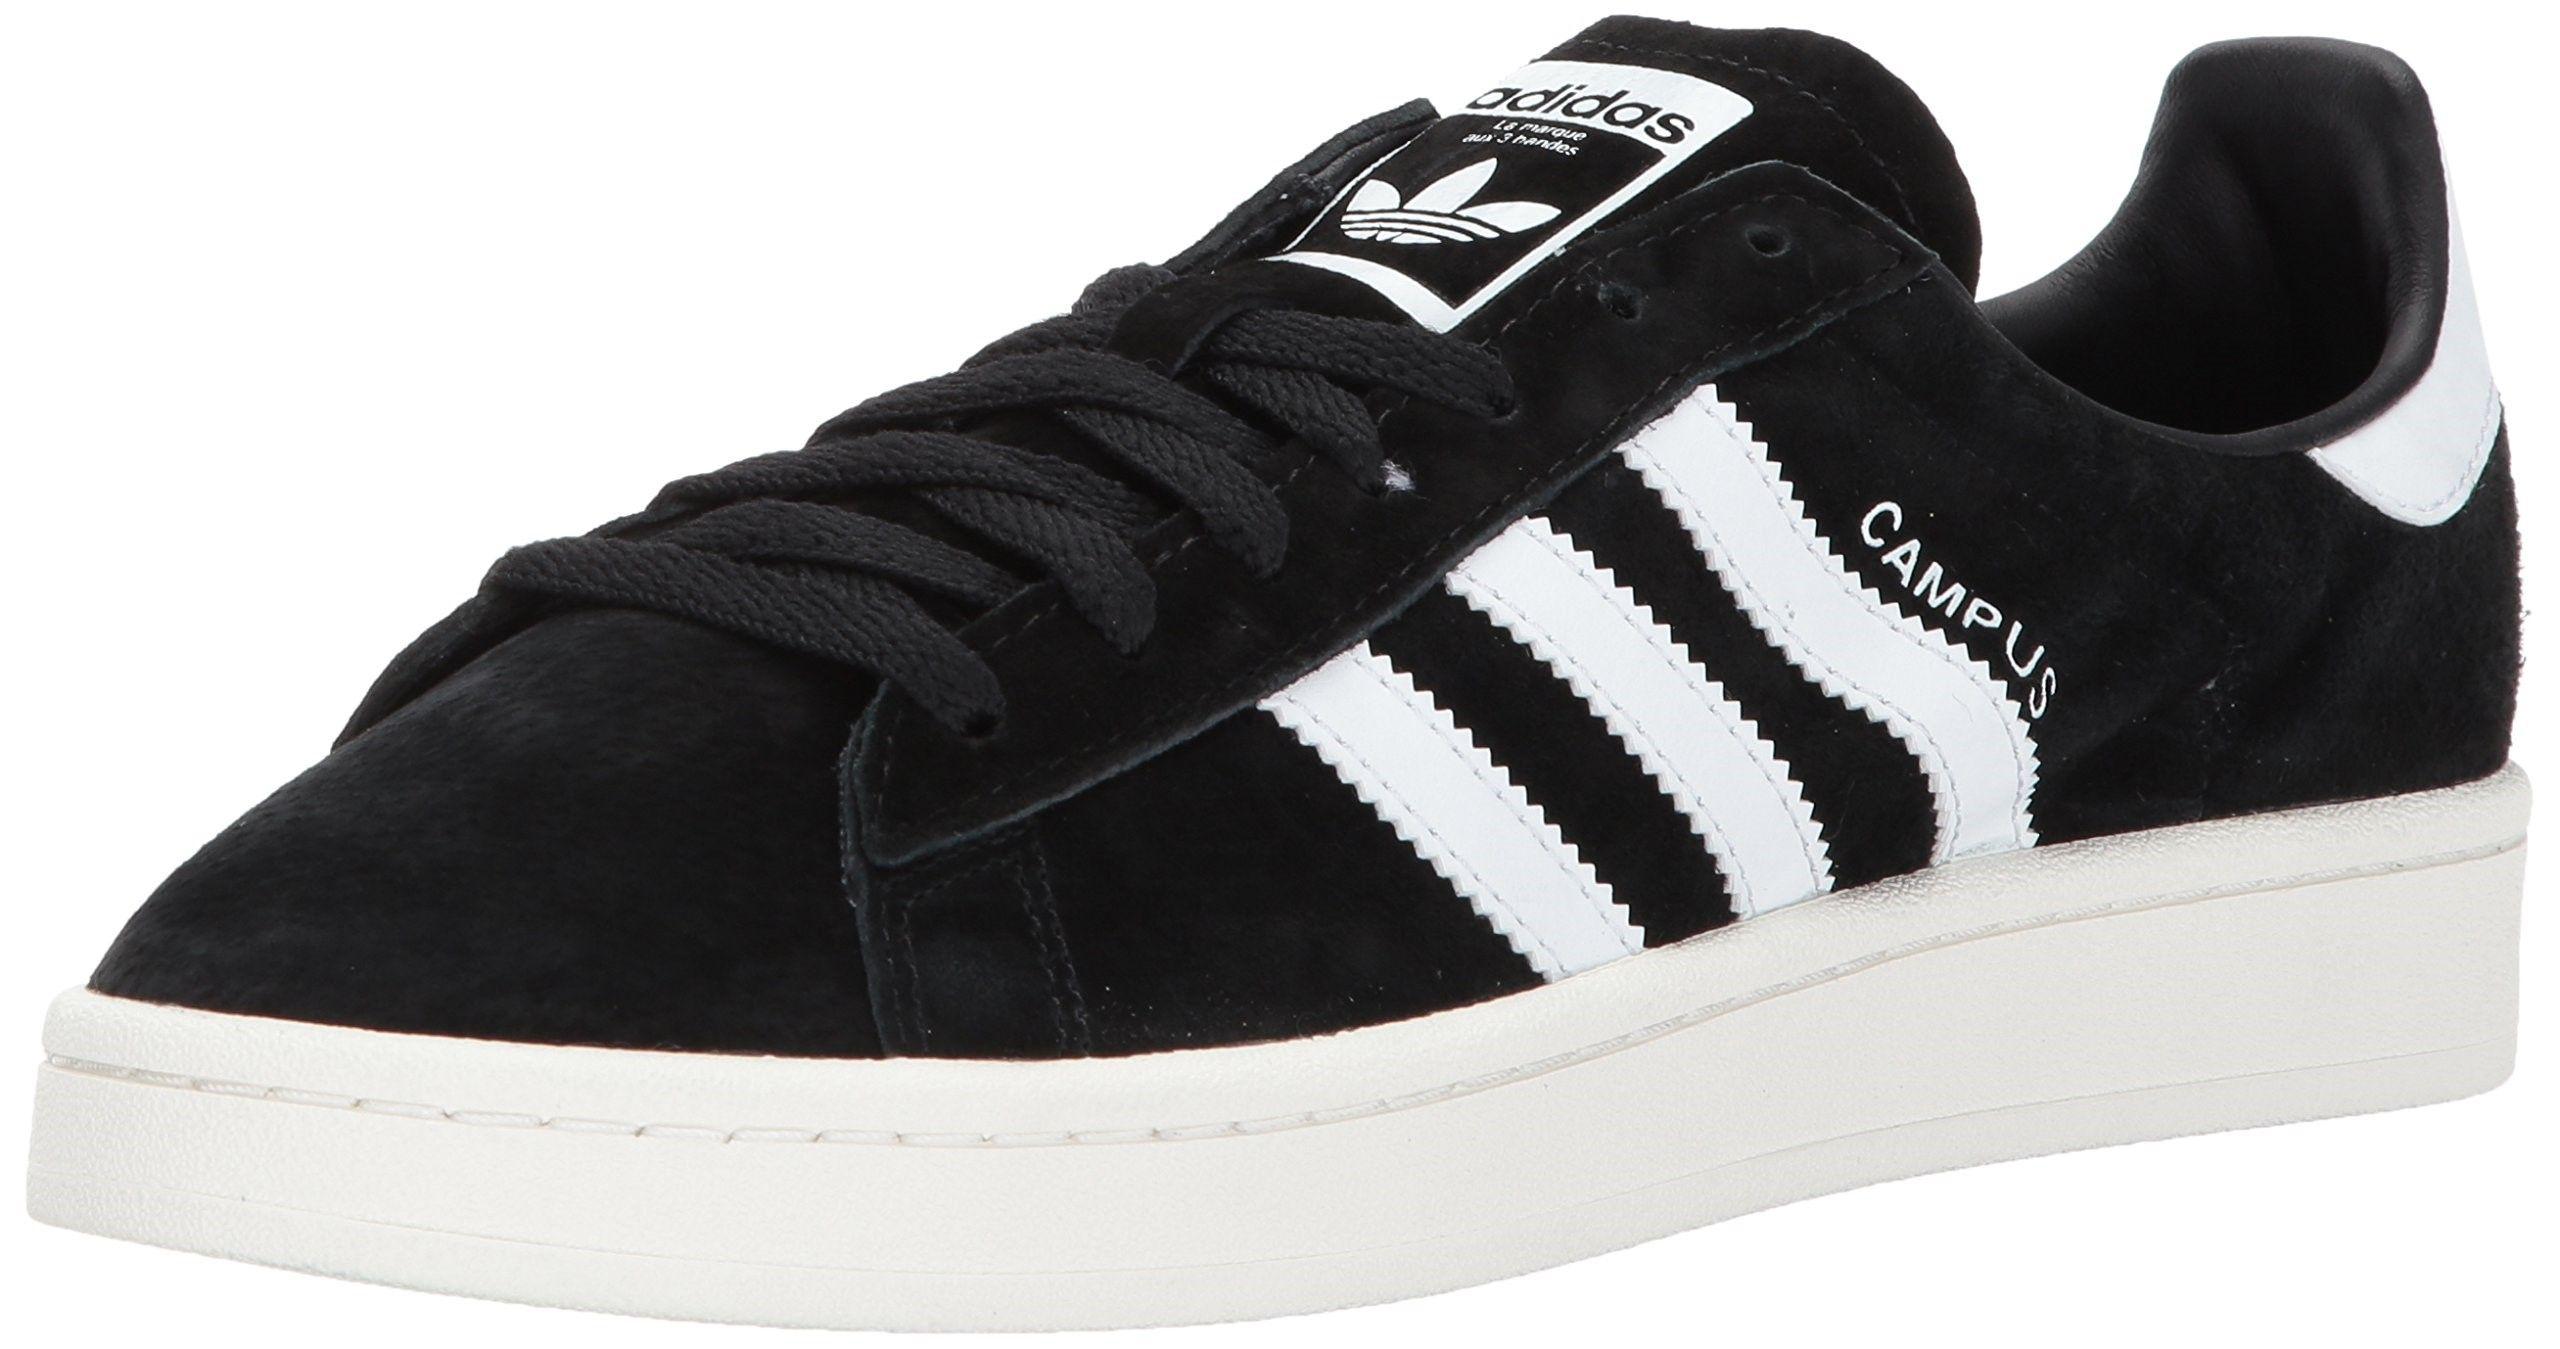 7ff18c2a5149c Adidas Men's Campus W Originals Cblack/Ftwwht/Cwhite Casual Shoe 8.5 Men US